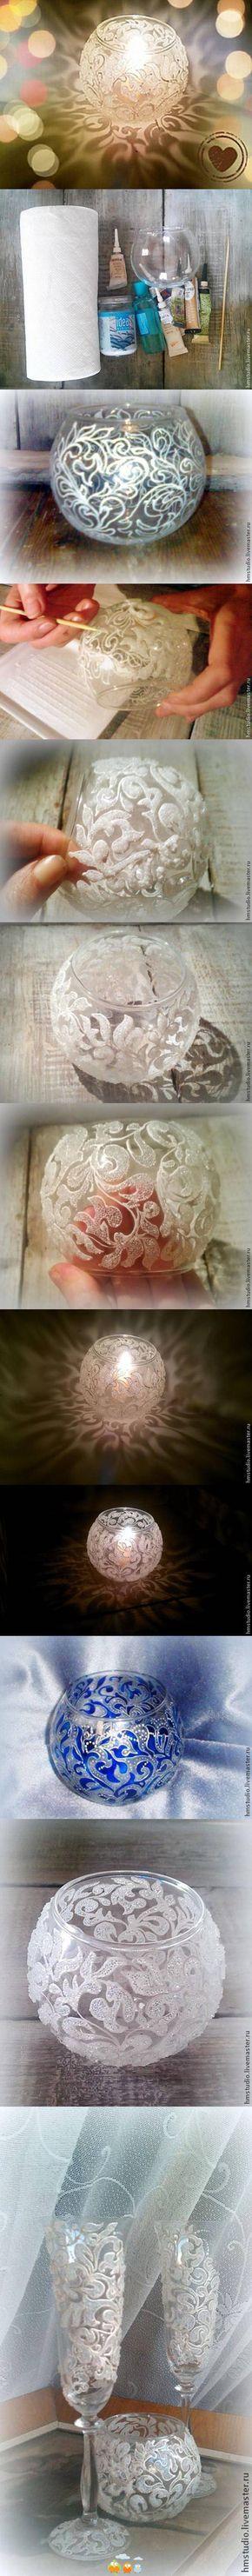 Some kind of painted tea holder